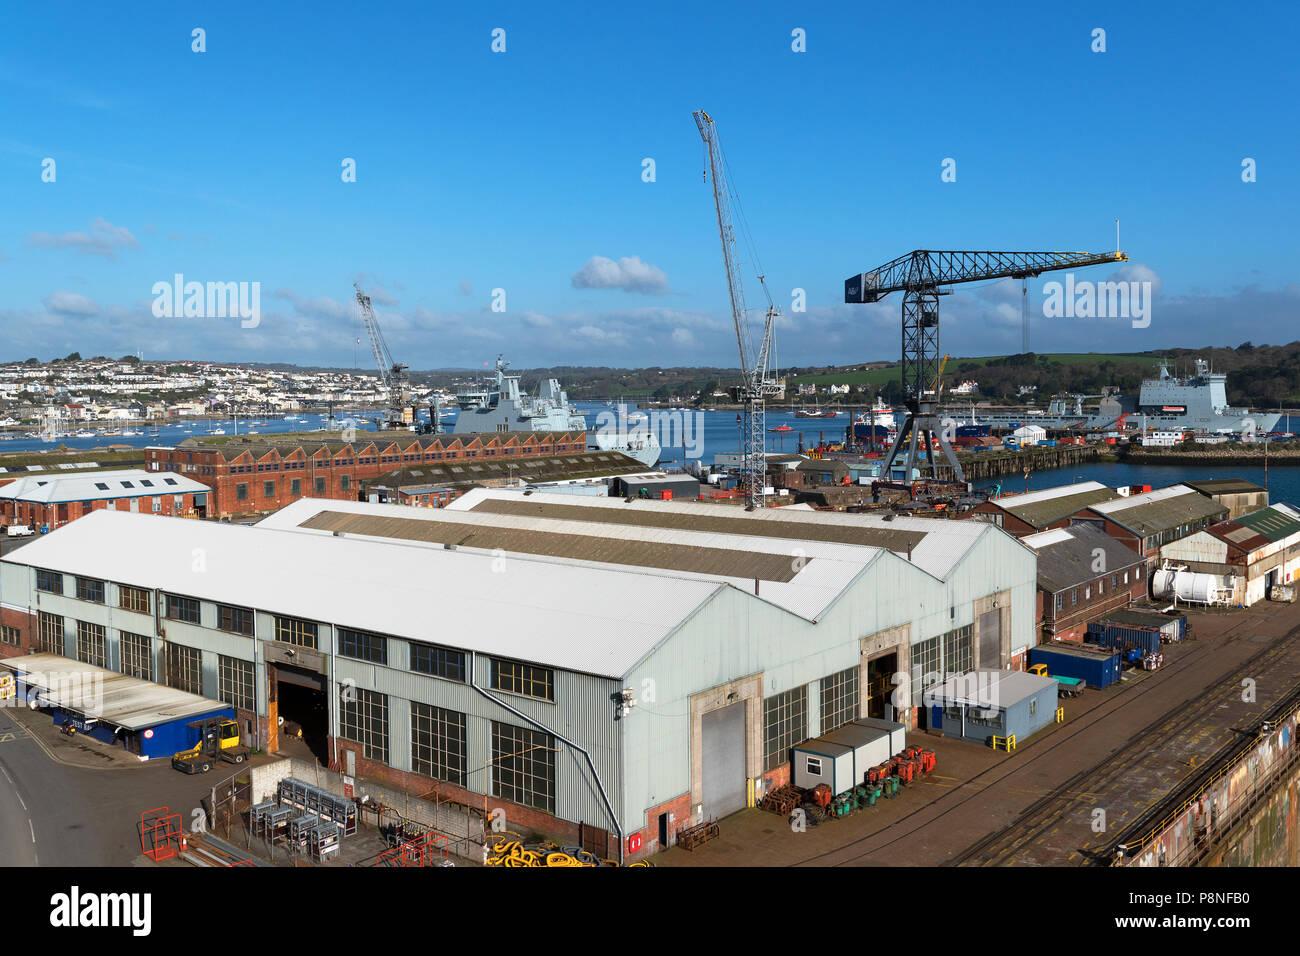 pendennis shipyard docks in falmouth, cornwall, england, britain, uk. - Stock Image